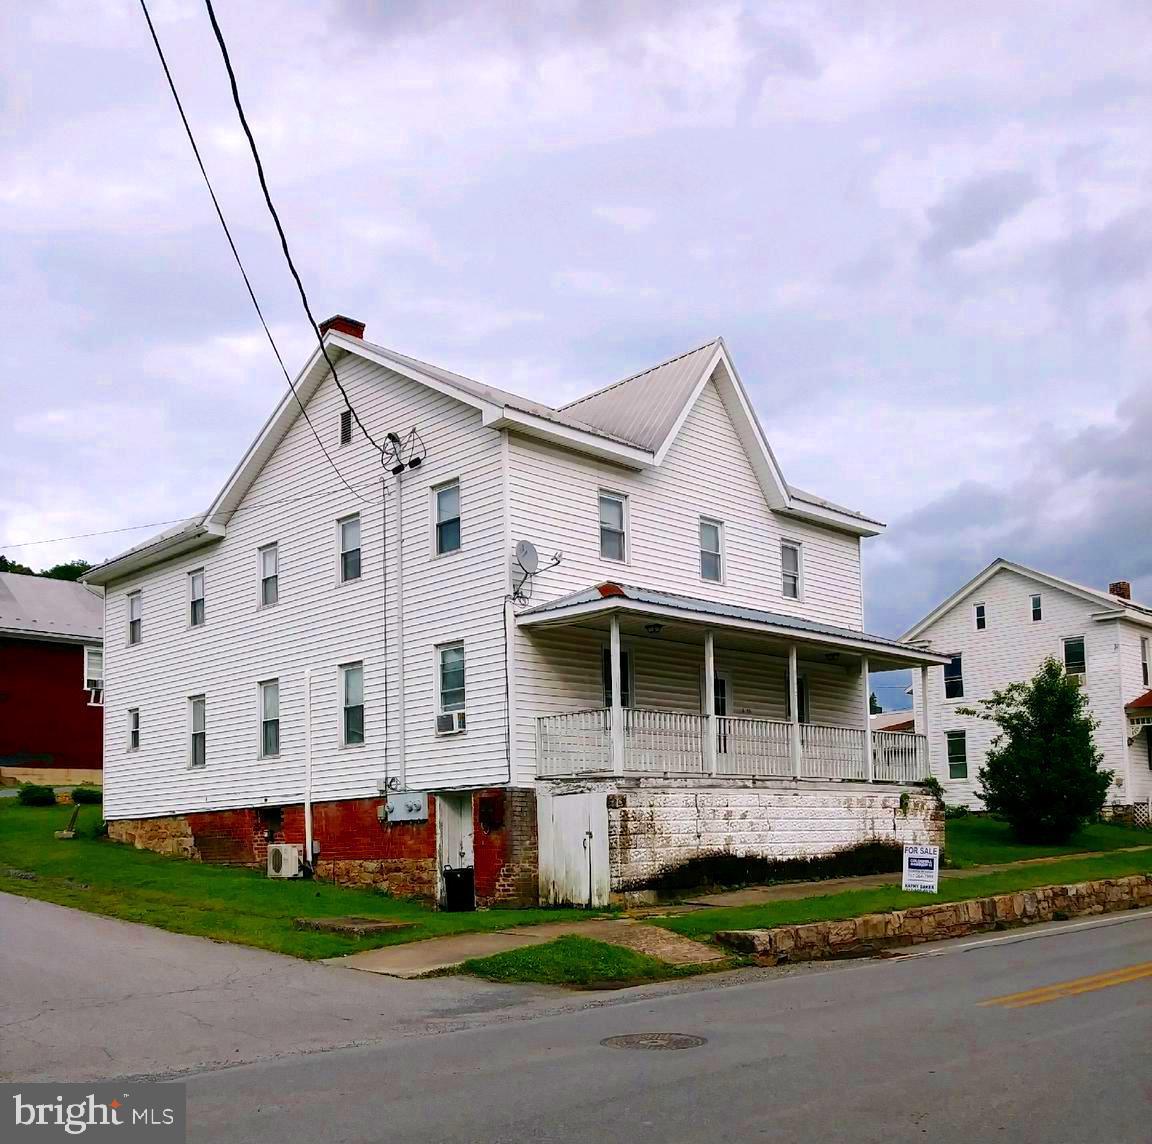 8619 HUDSON STREET, THREE SPRINGS, PA 17264